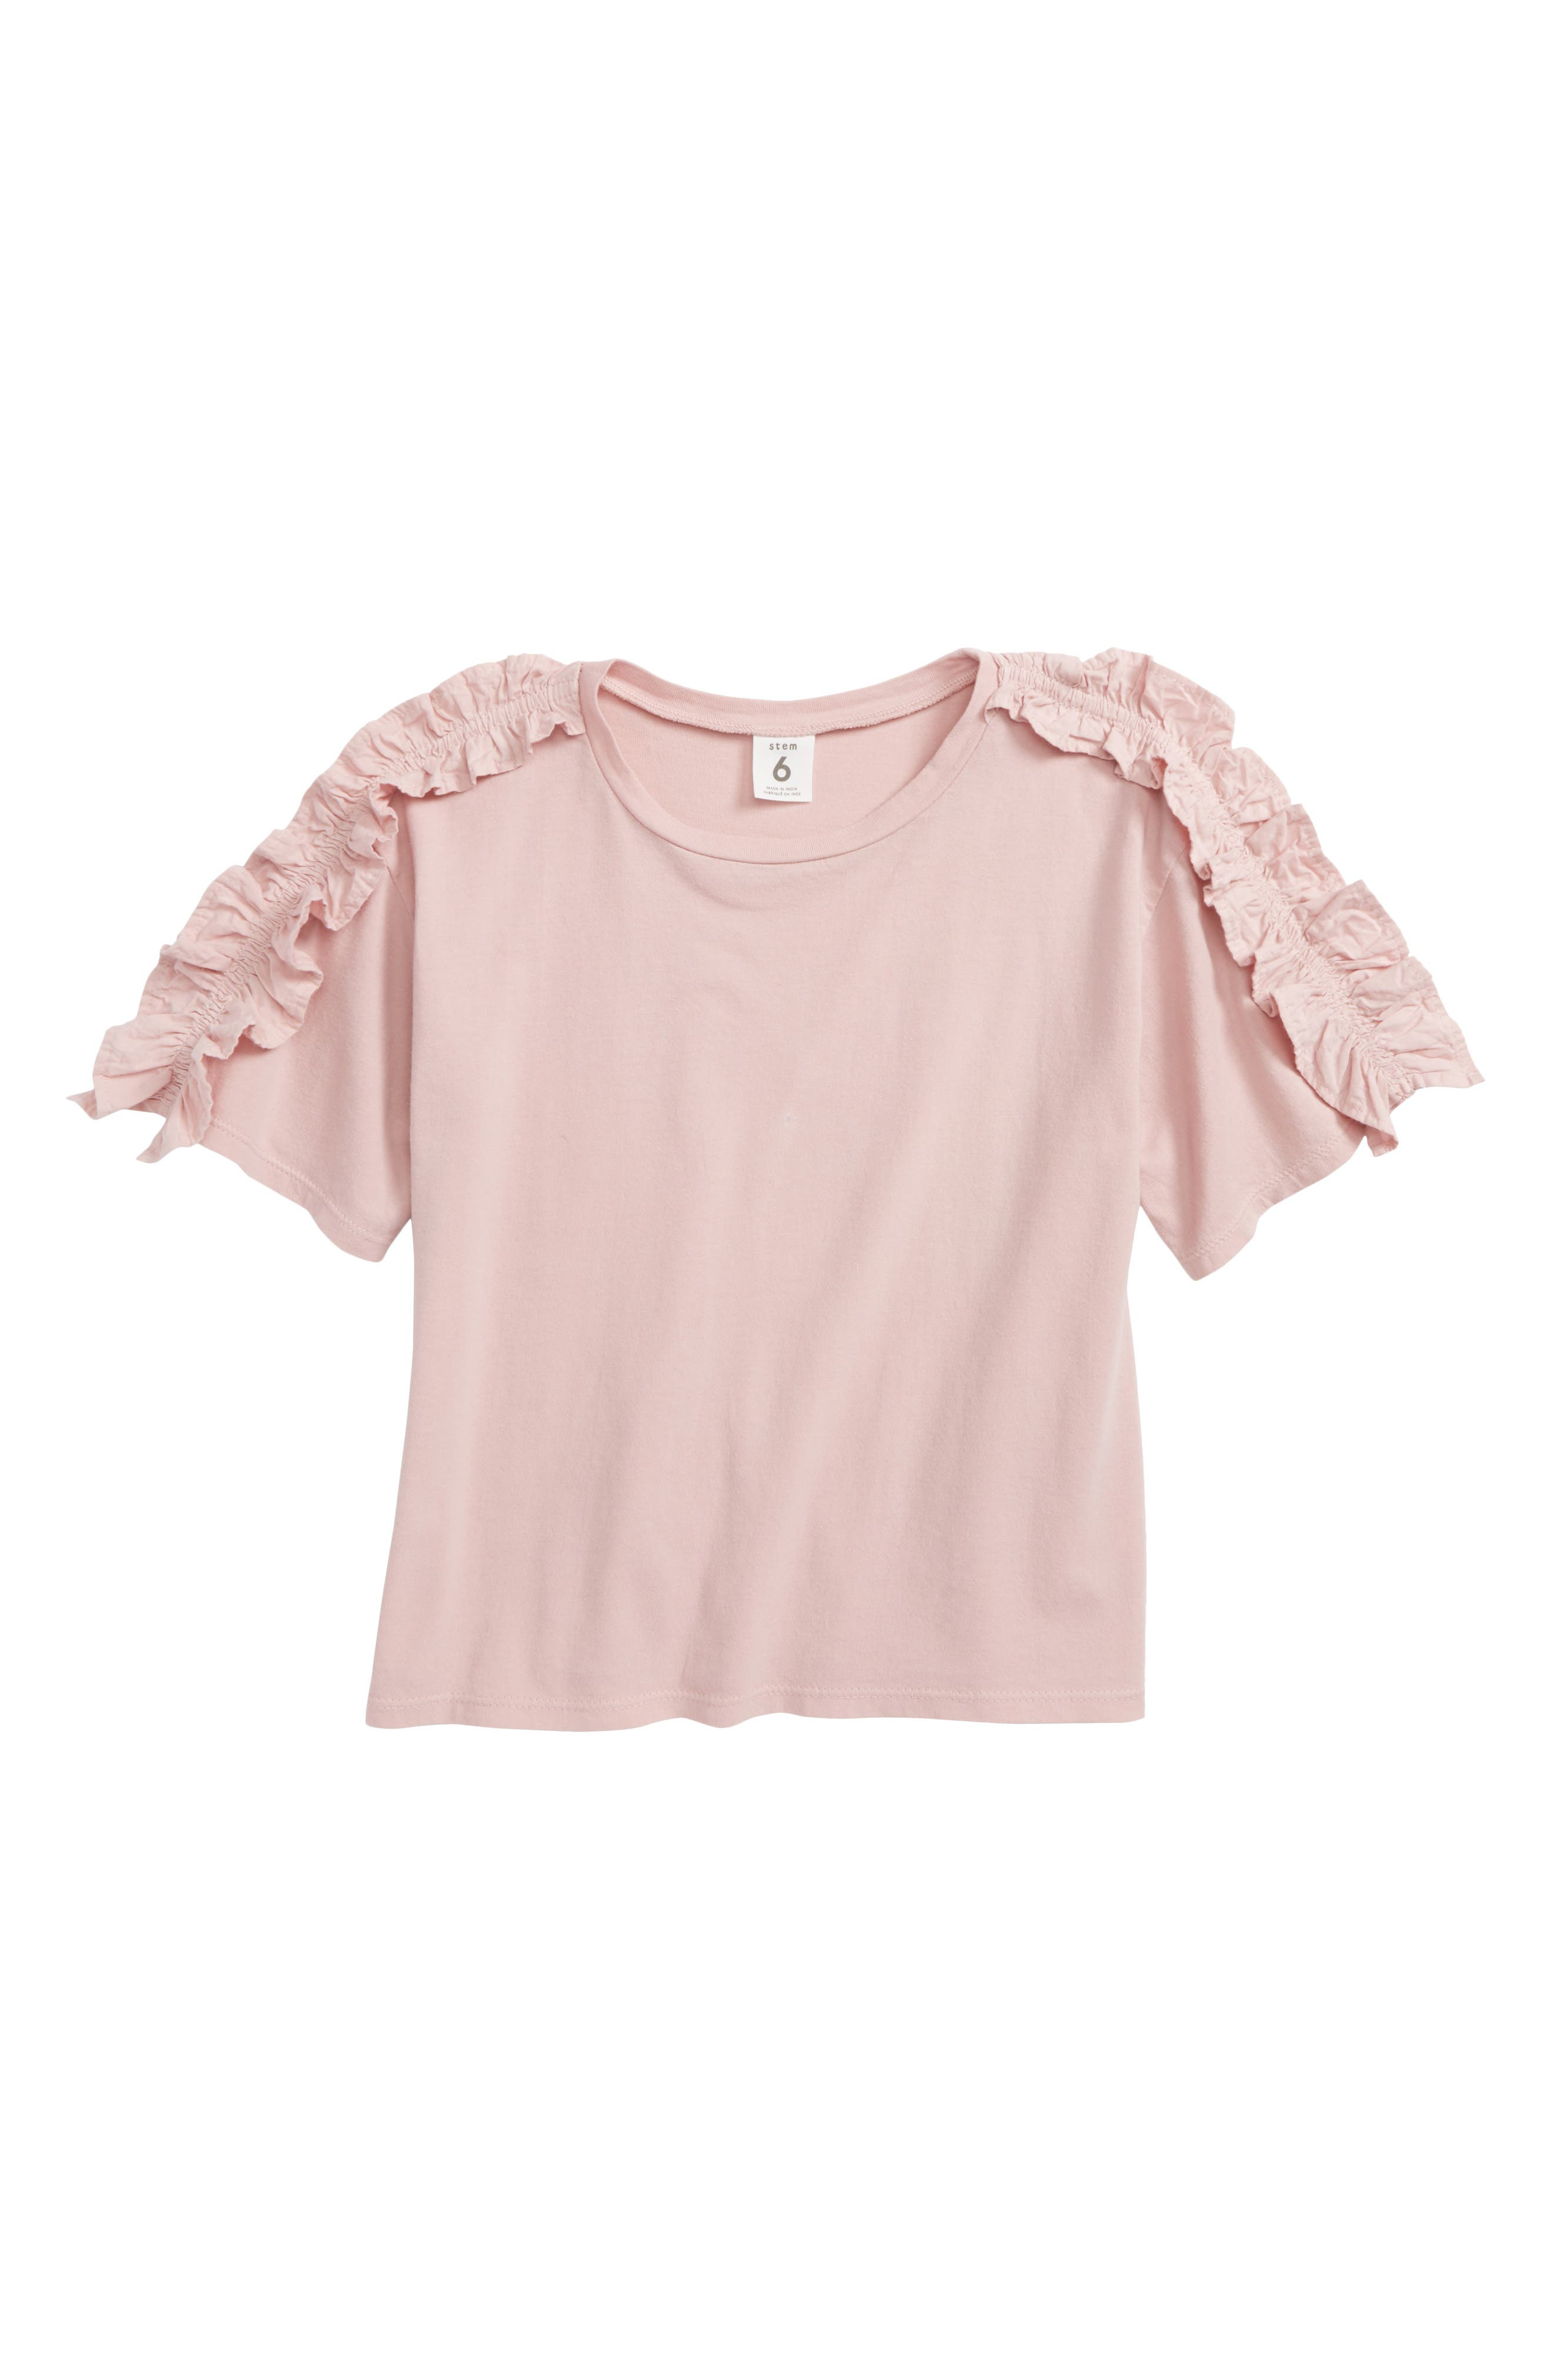 Ruffle Sleeve Tee,                         Main,                         color, Pink Apricot